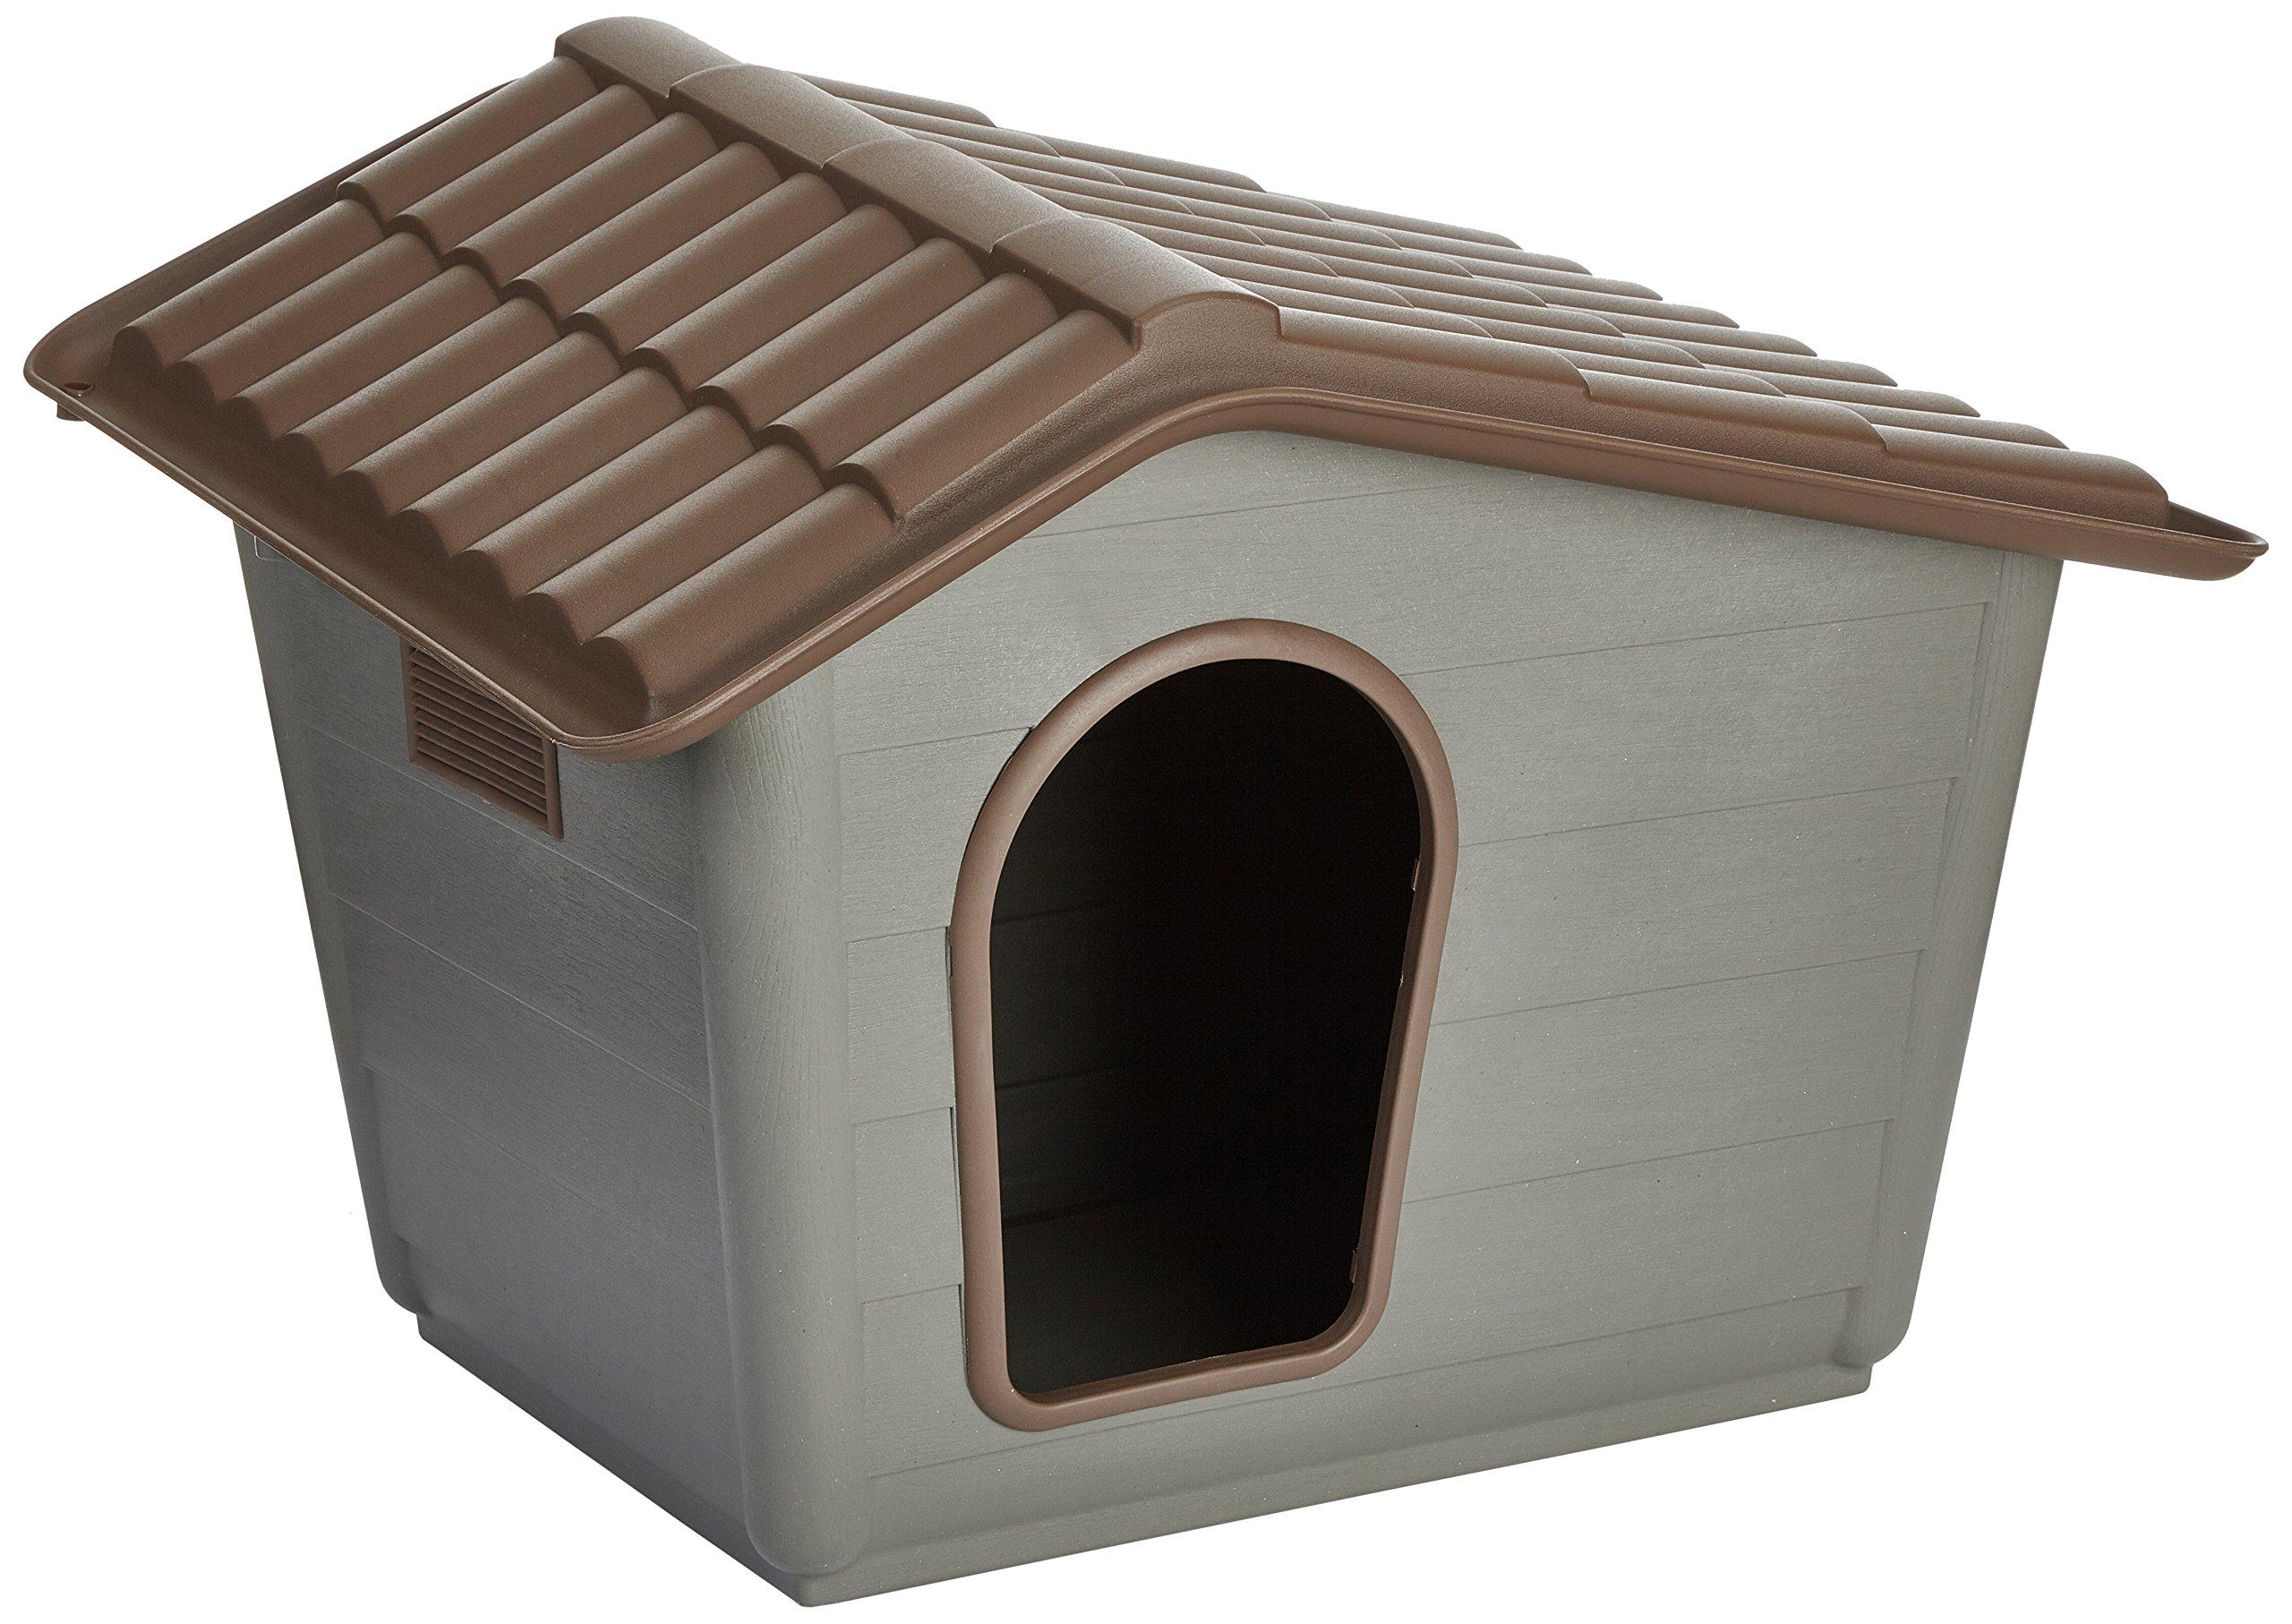 Rosewood Nayeco P100010Eco Mini Kennel, 41x 60x 50cm, Green